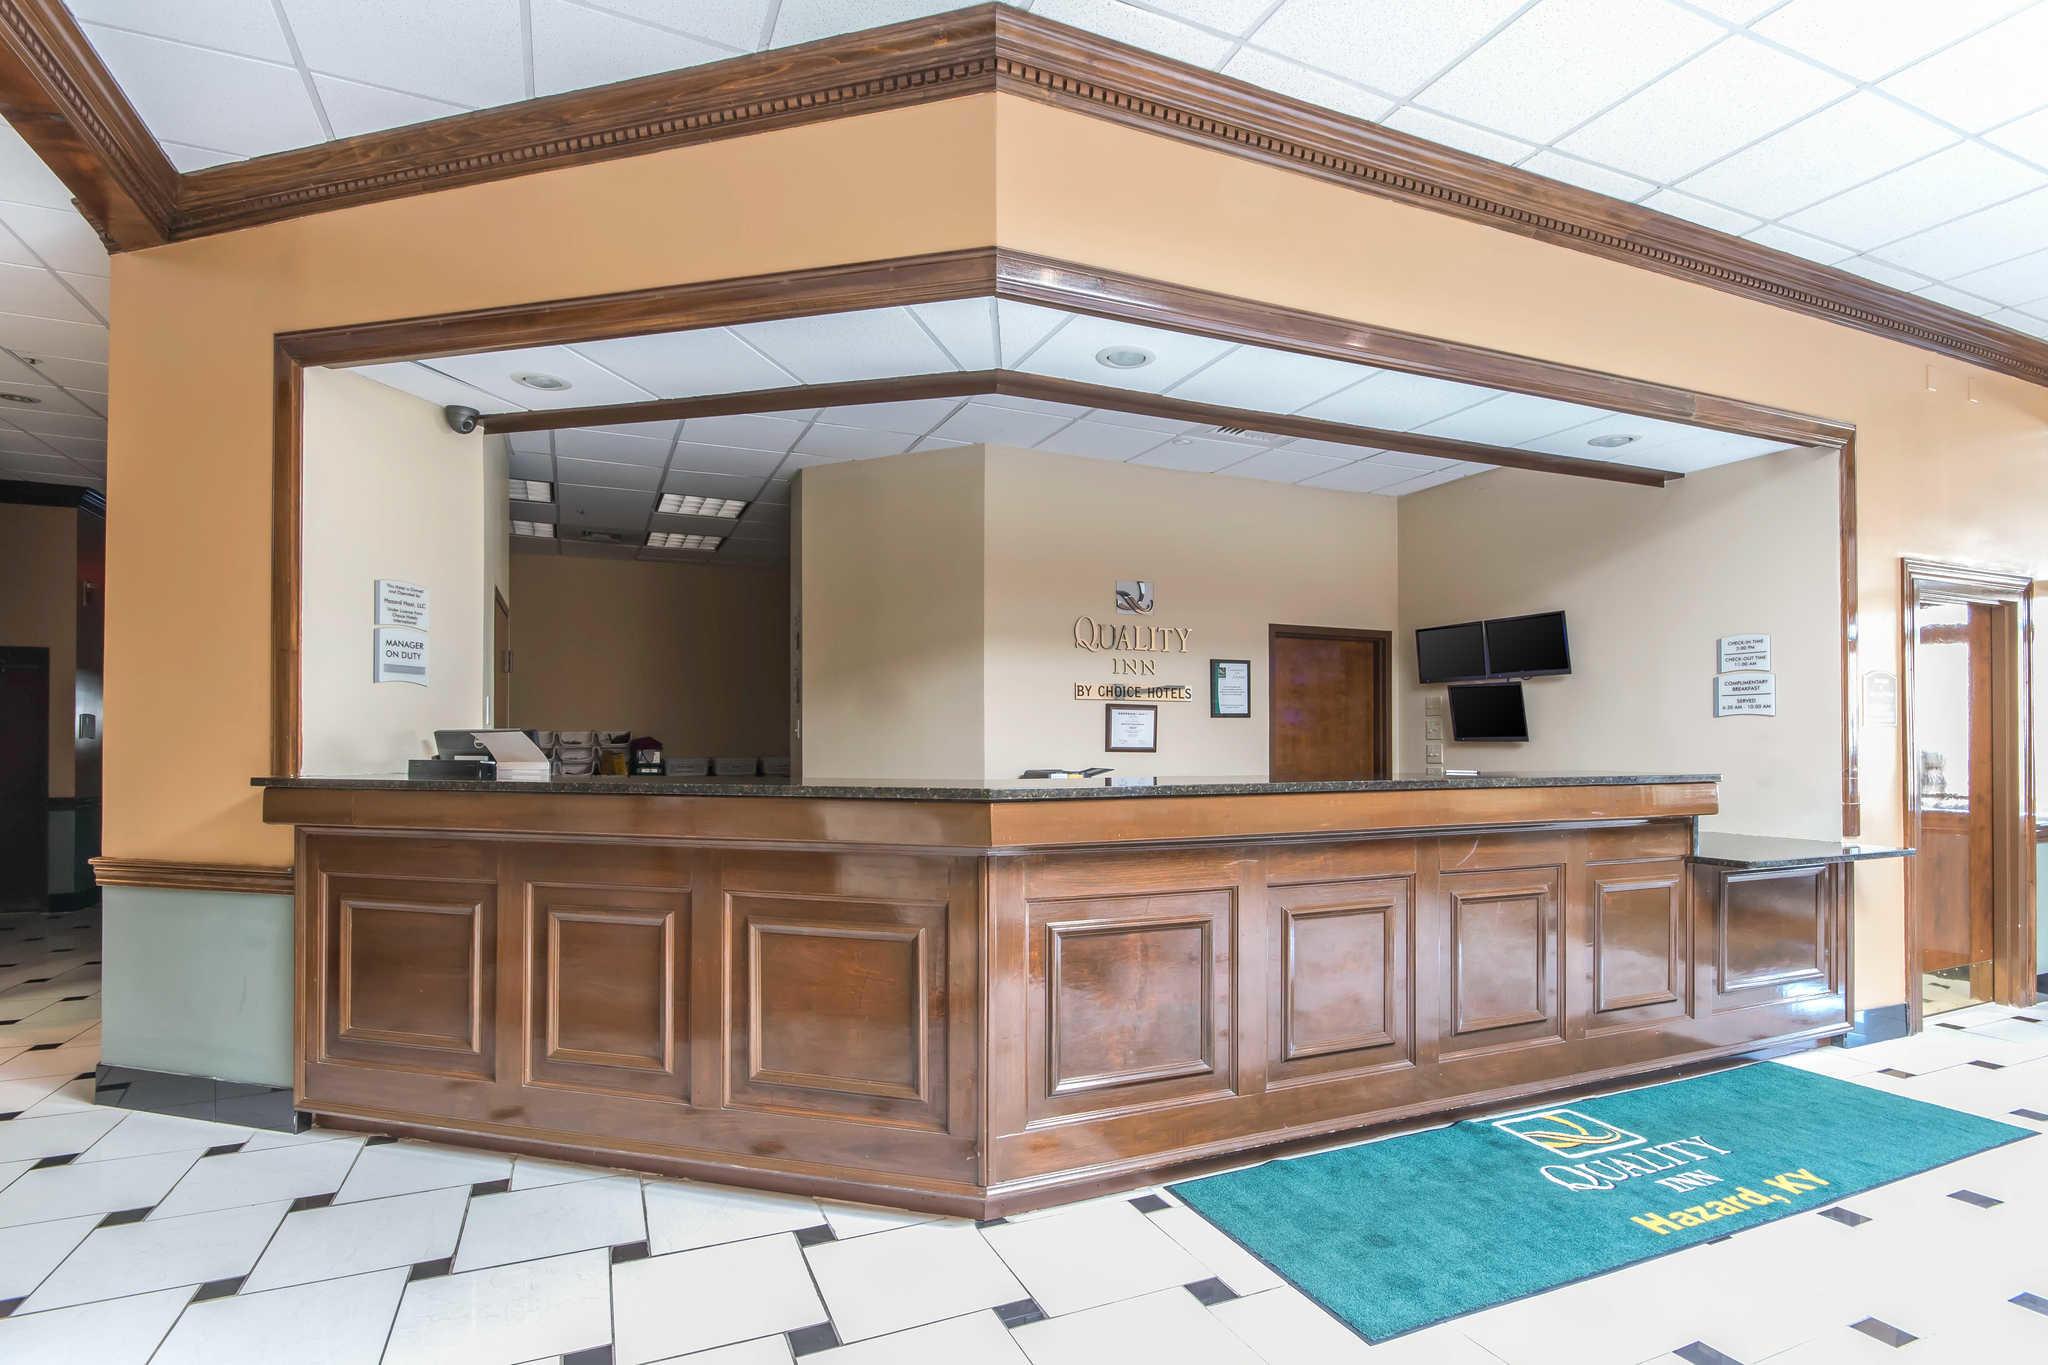 Quality Inn - Closed image 1